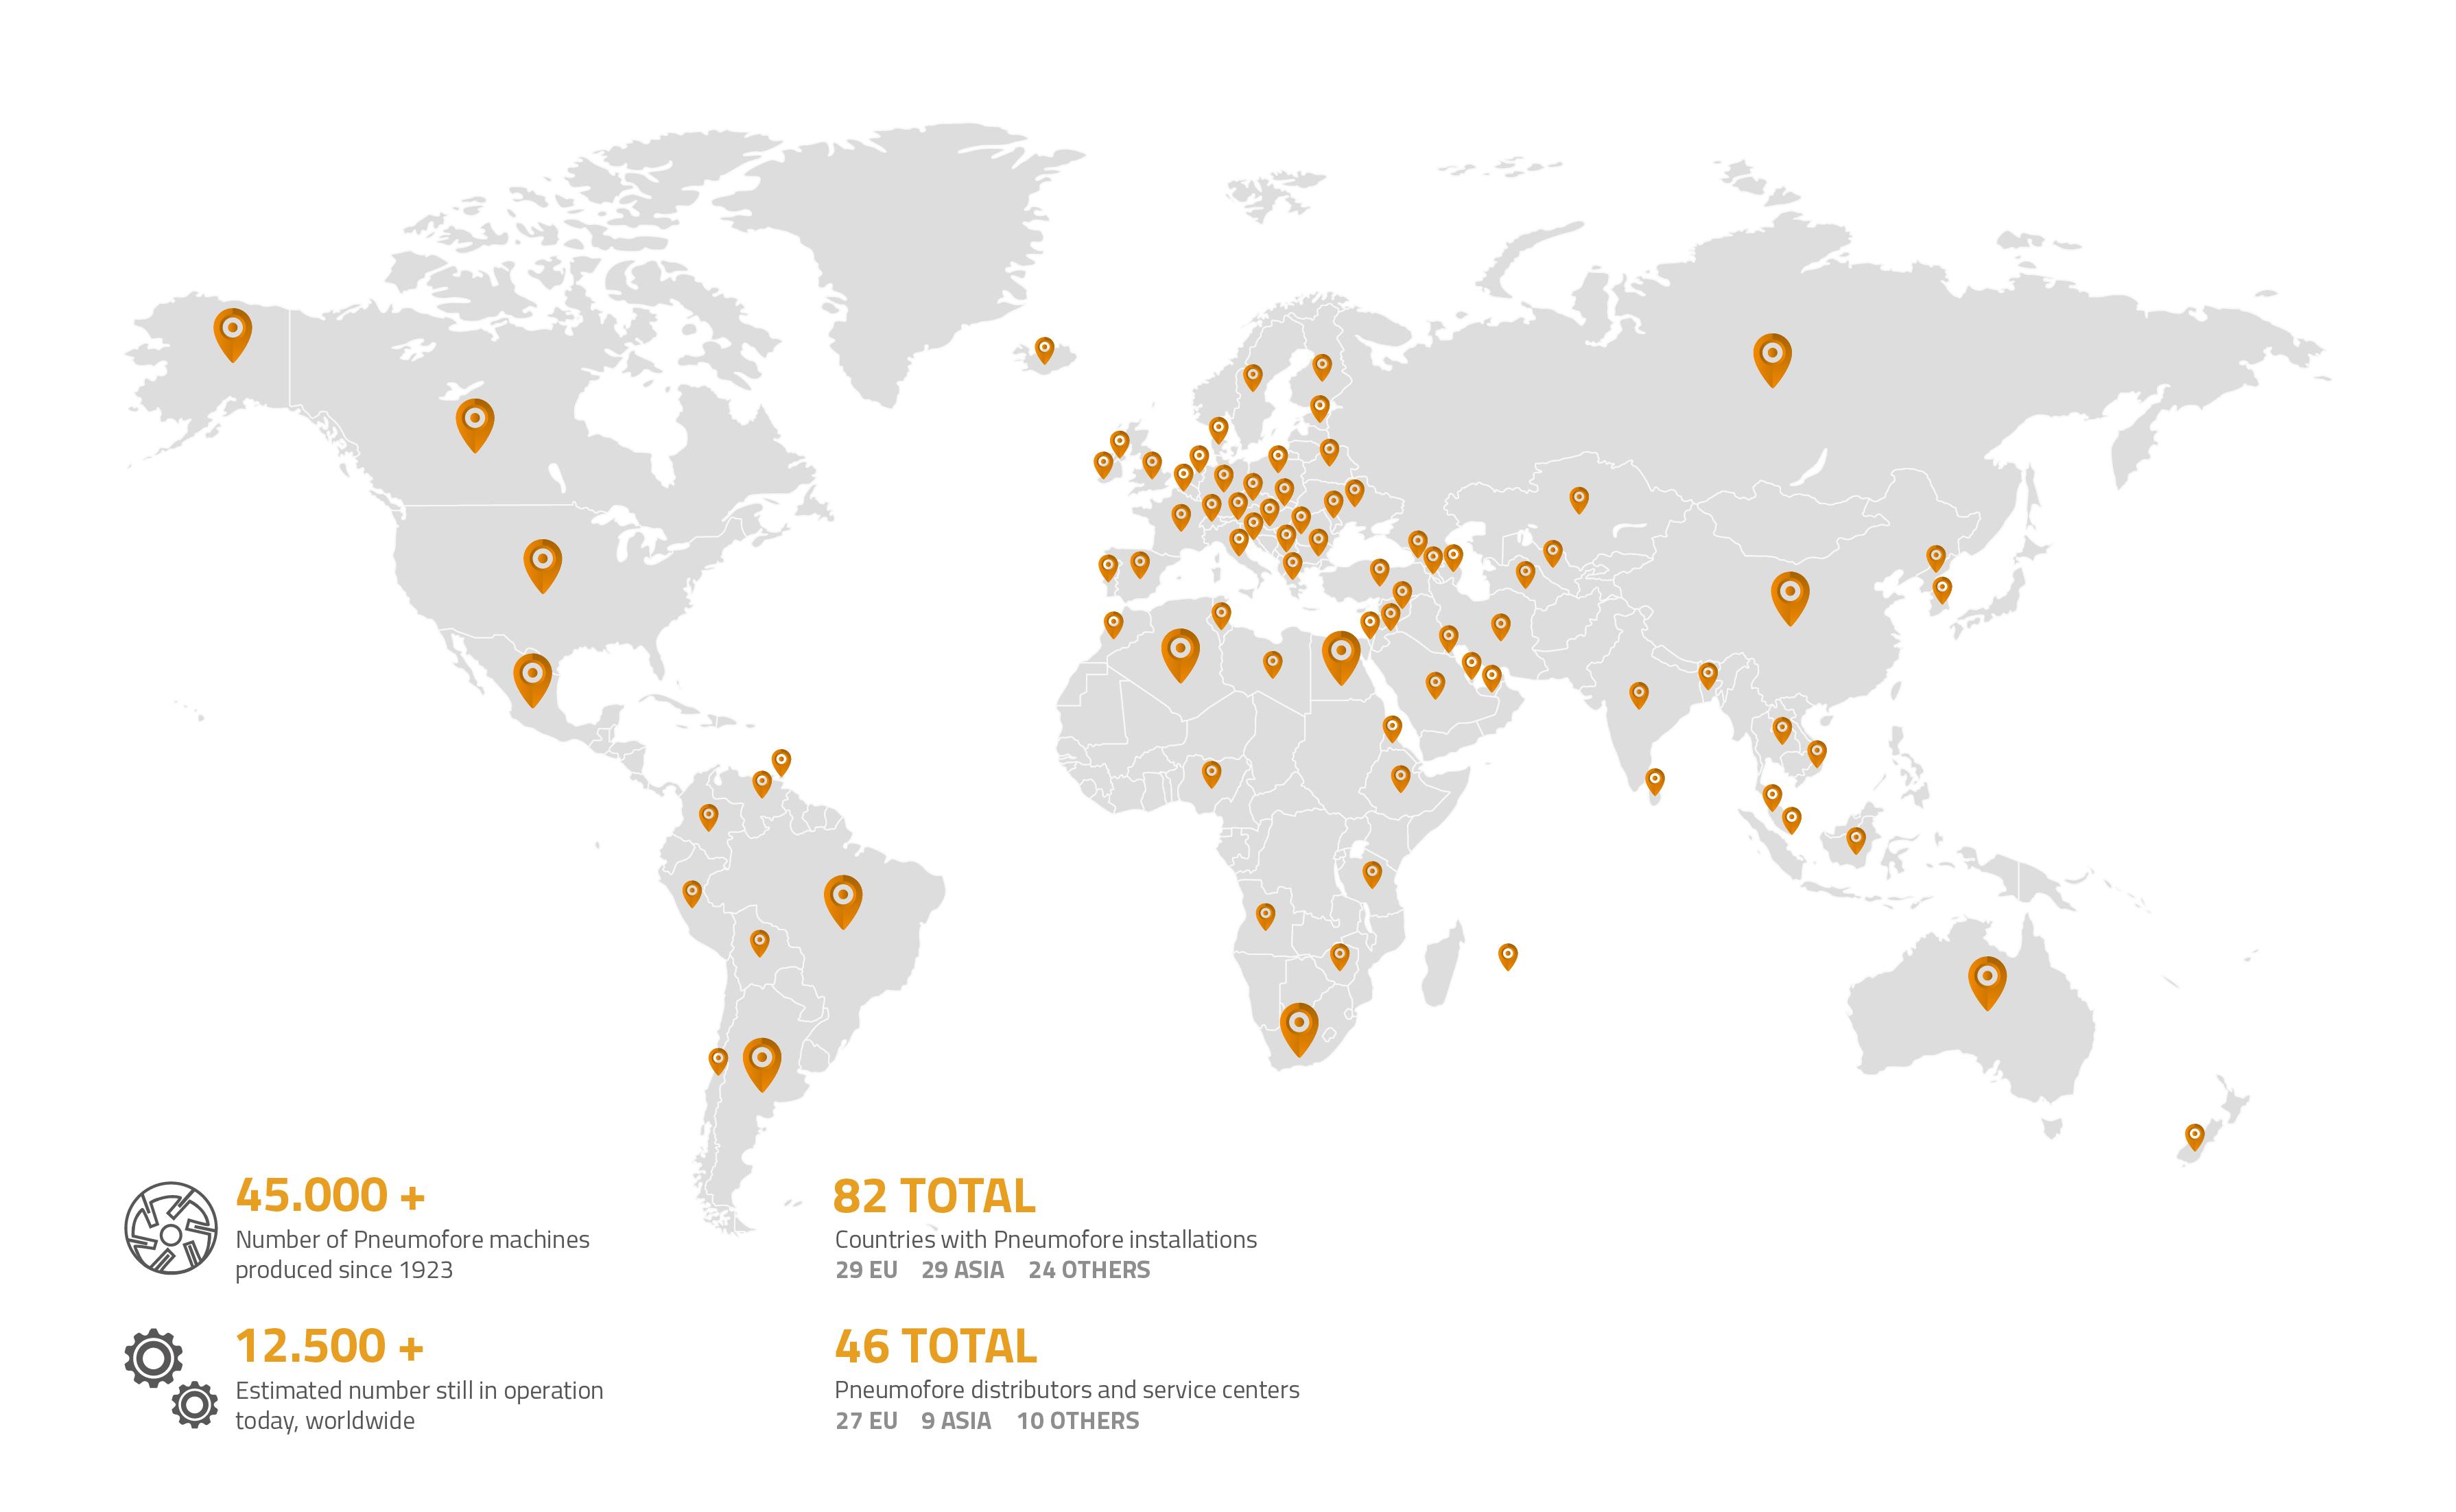 Pneumofore Worldwide - 2021